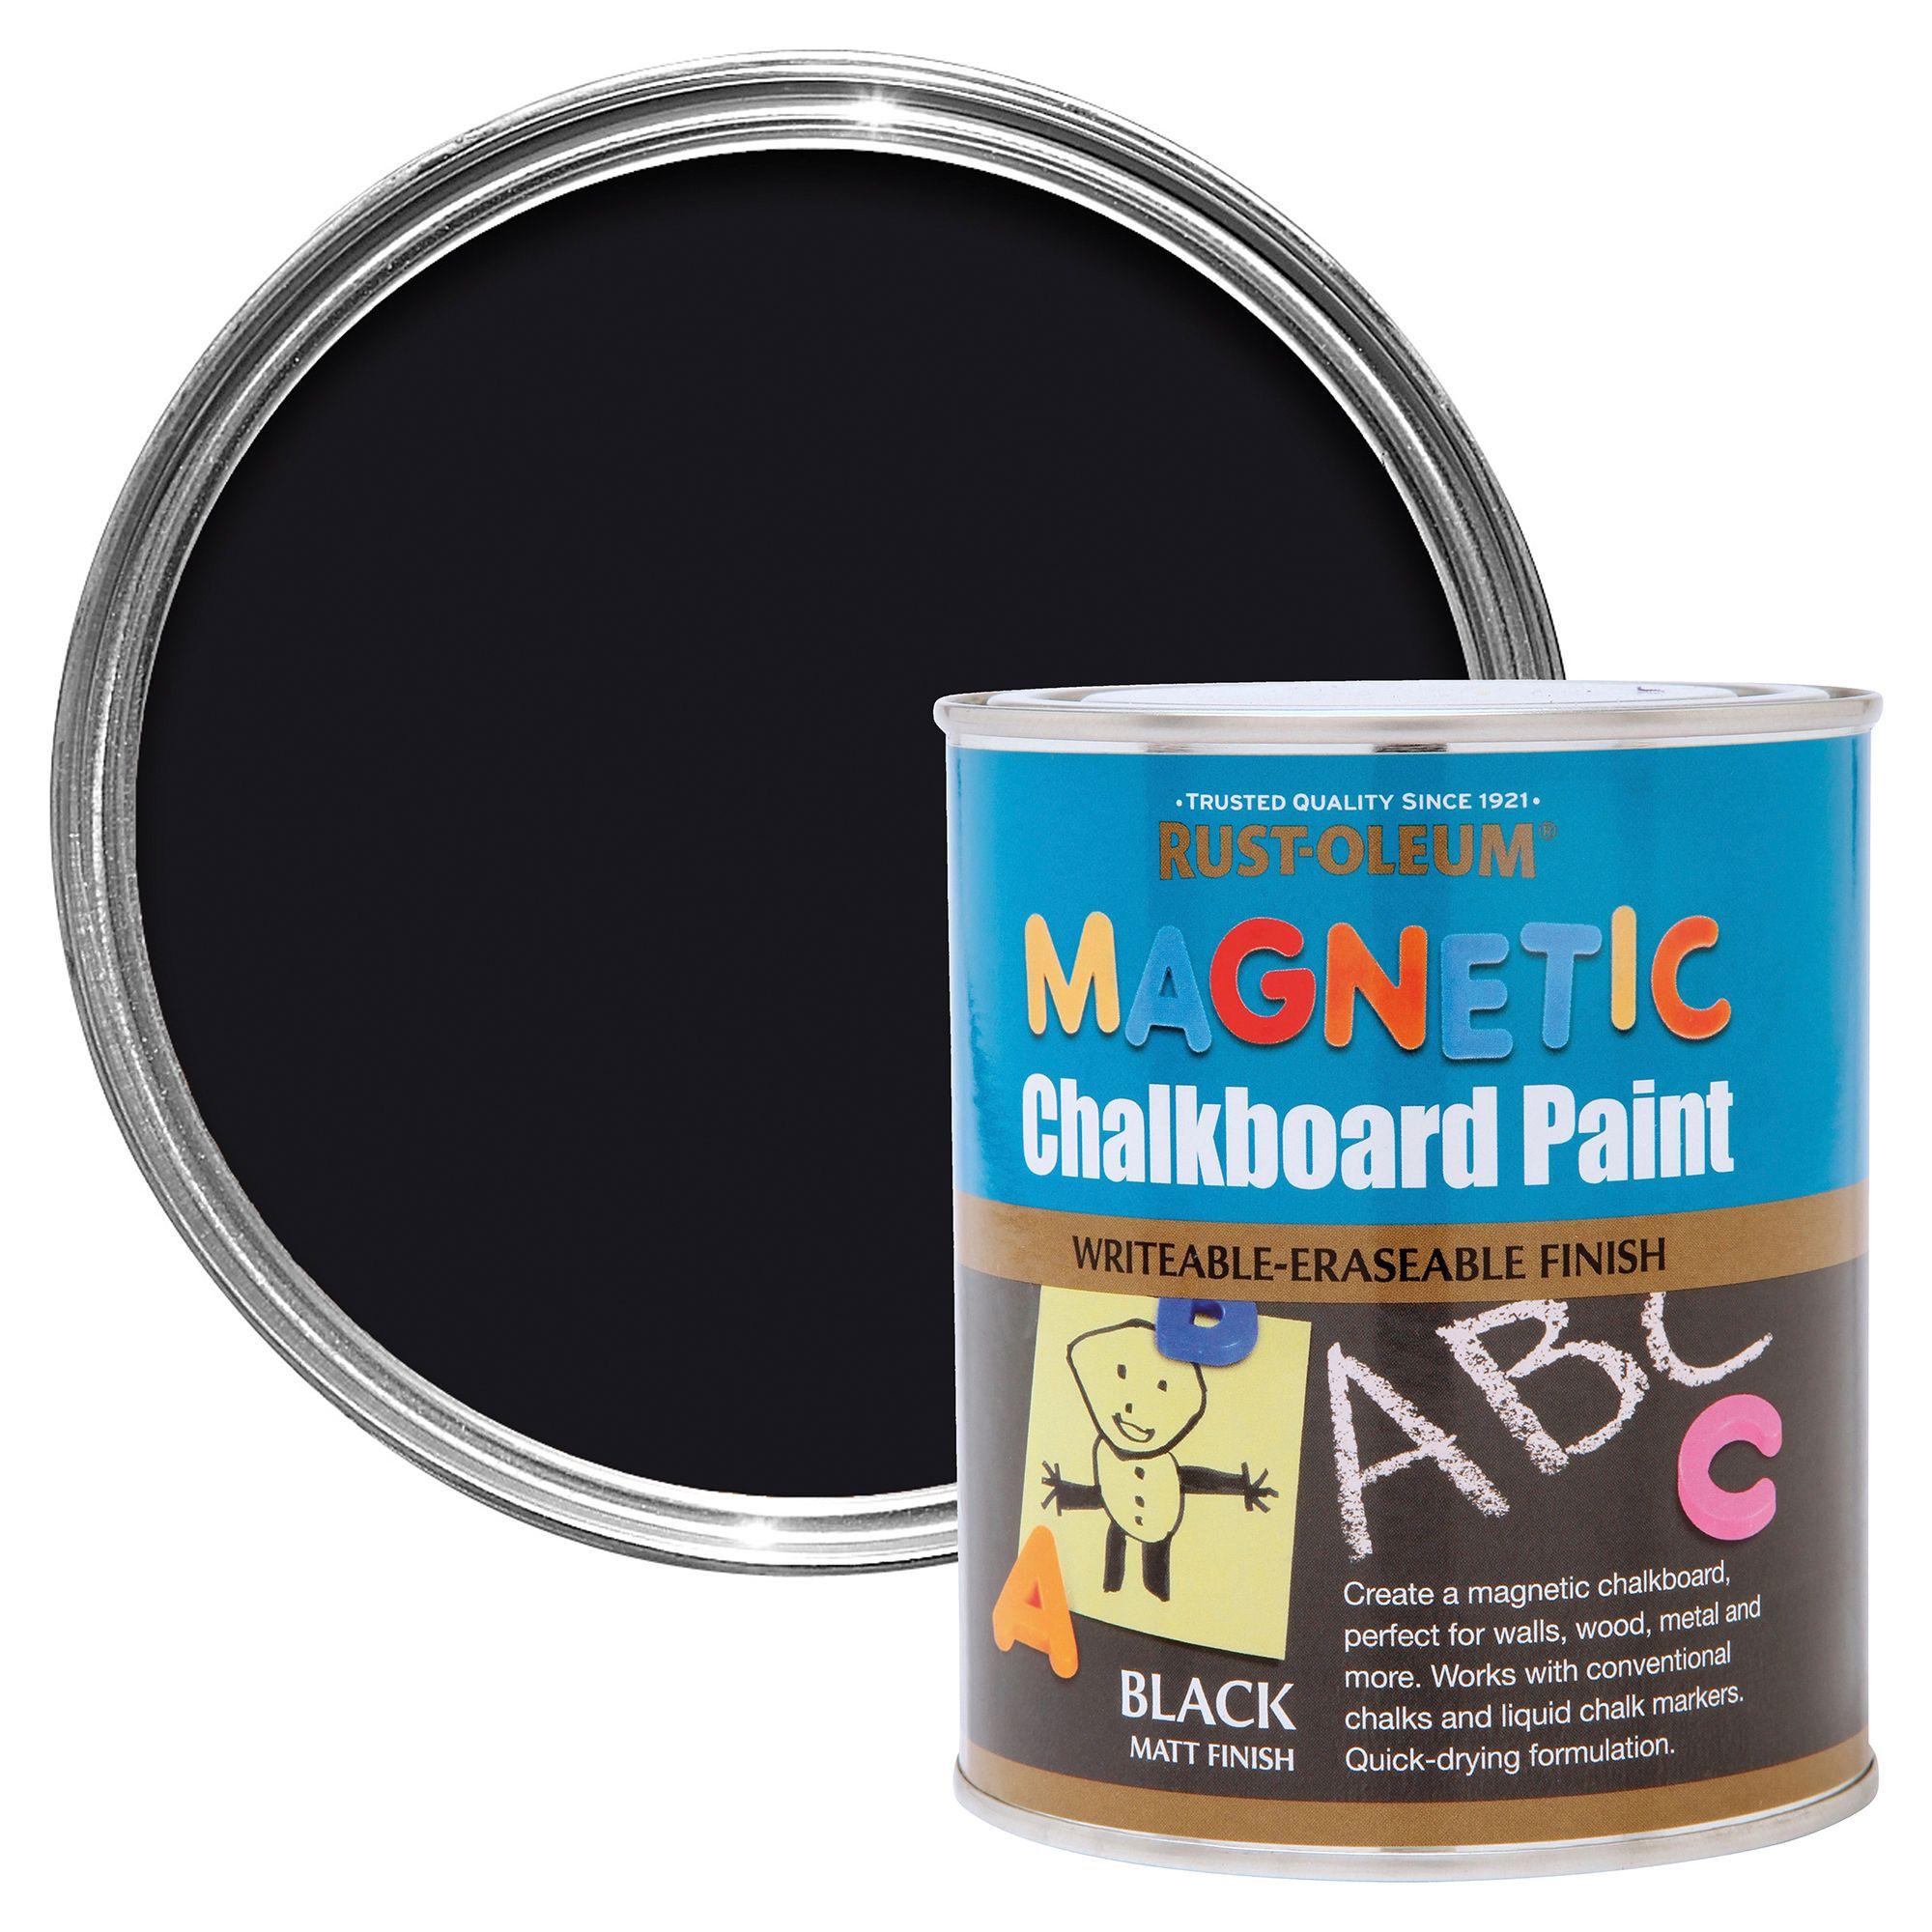 Rust-Oleum Black Magnetic Matt Chalkboard Paint 750ml